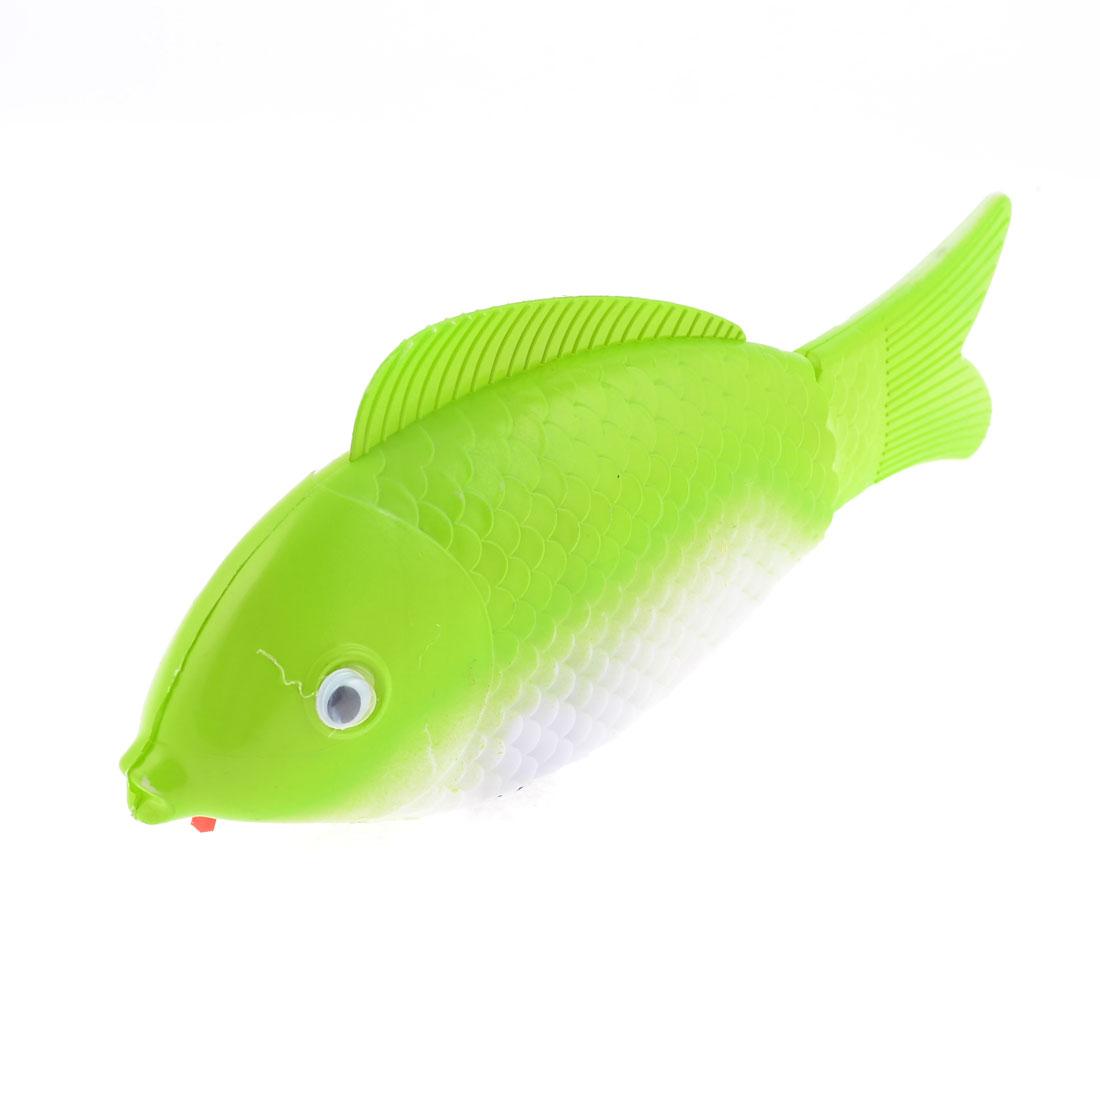 Kids Gift White Green Plastic Body Three Wheels Walking Fish Toy